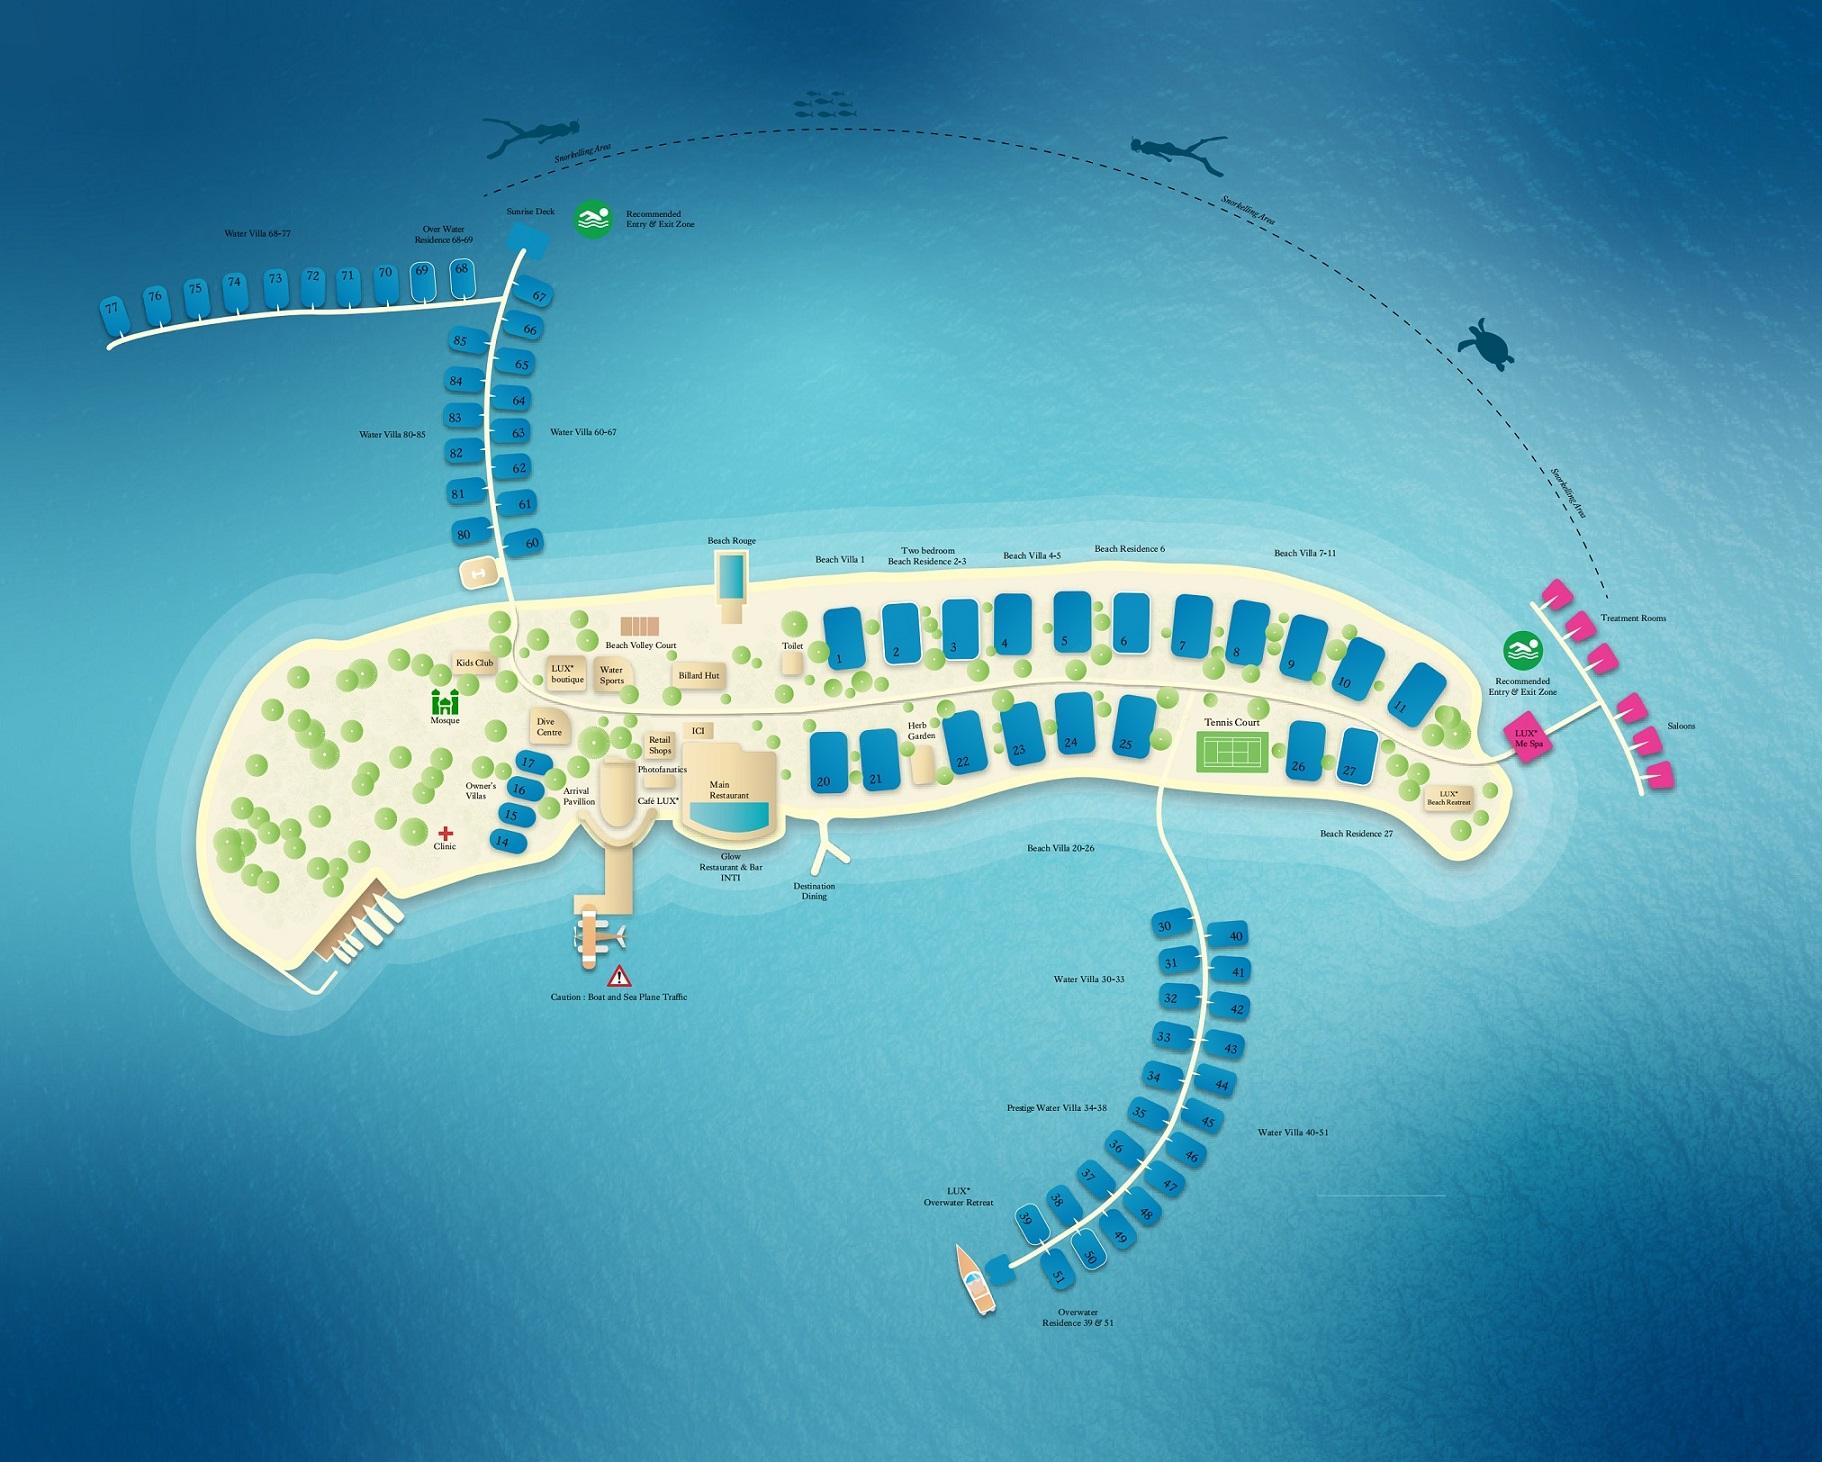 马尔代夫 北丽世岛 LUX* North Male Atoll Maldives 平面地图查看